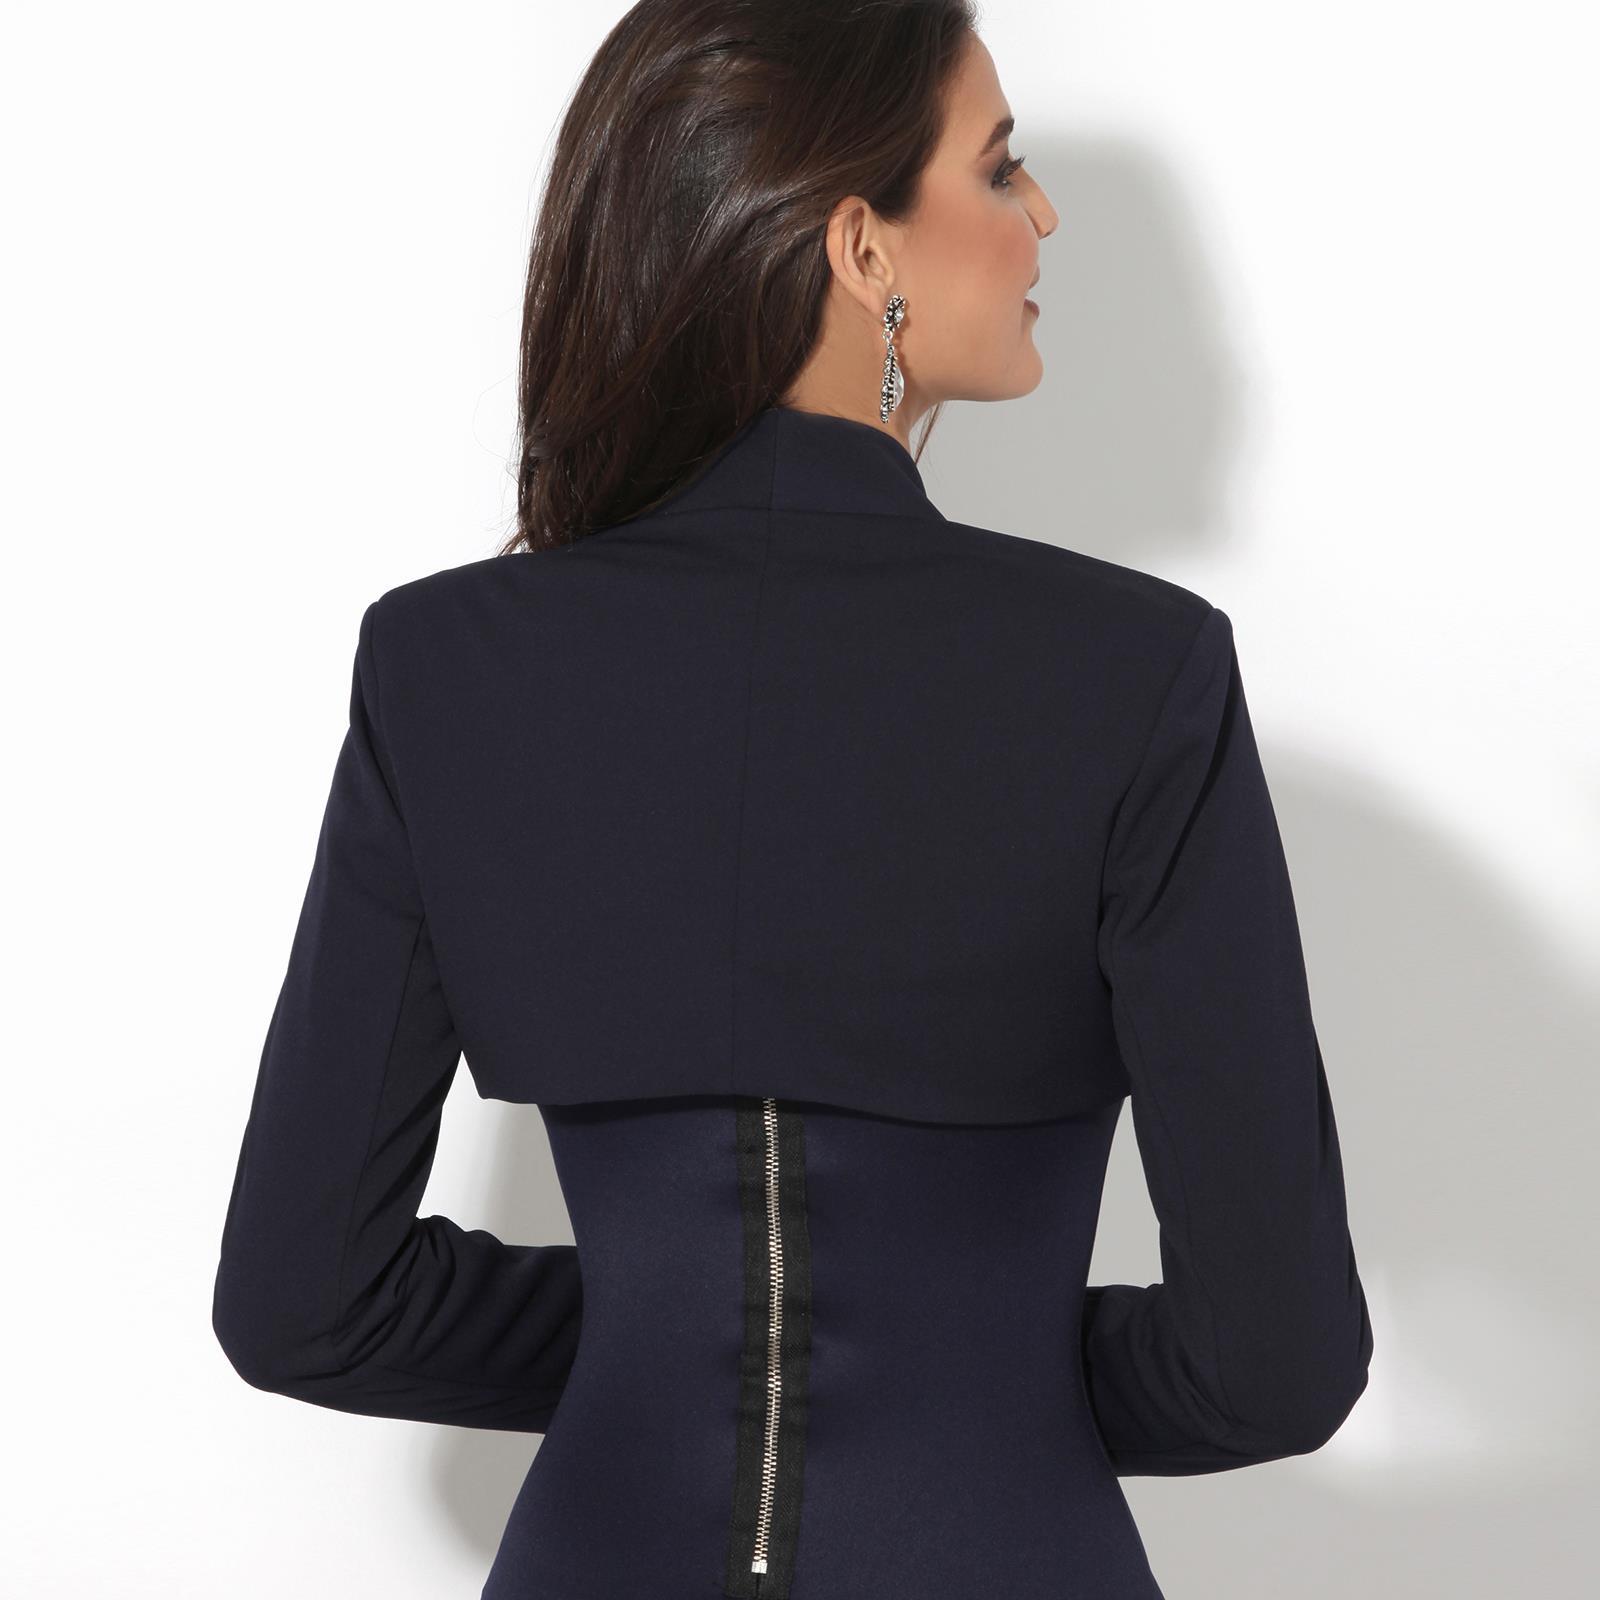 Femmes-Veste-Courte-Bolero-Blazer-Jacket-Manche-3-4-Gilet-Cardigan-Cache-Epaule miniature 5